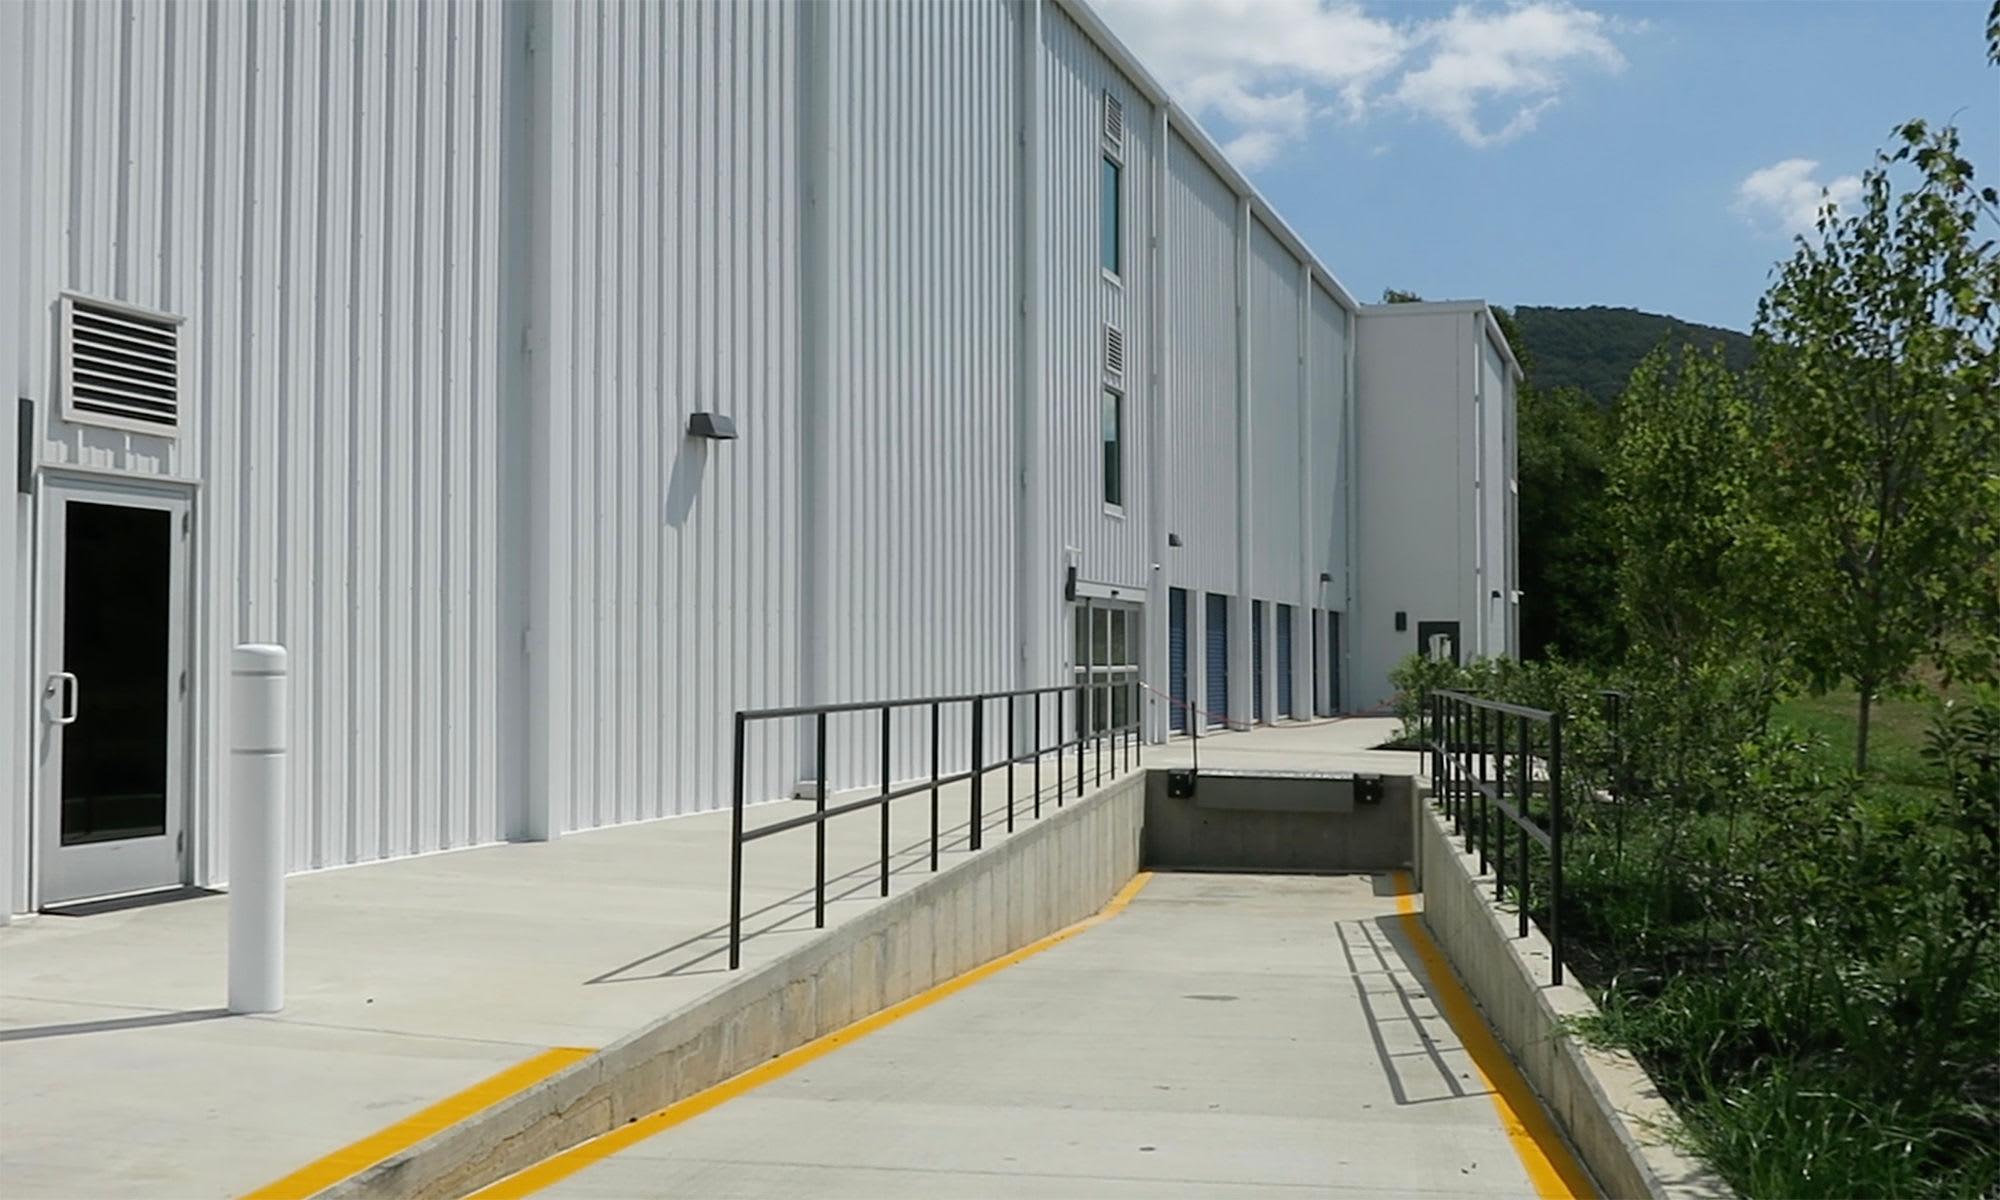 Tractor Trailer Accessible Dock at Virginia Varsity Self Storage in Roanoke, Virginia is located